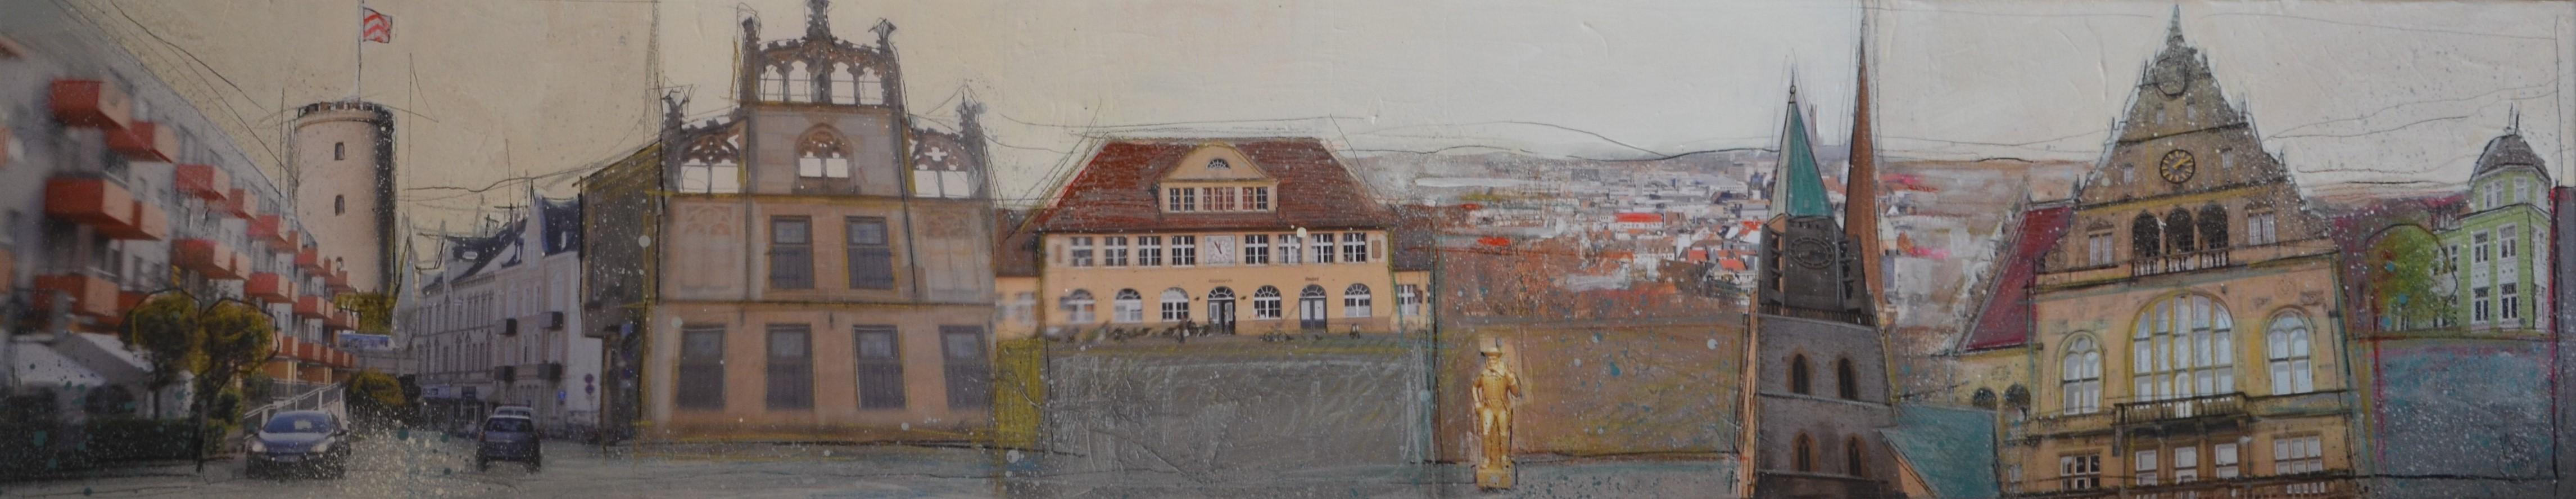 Bielefeld im Panoramaformat